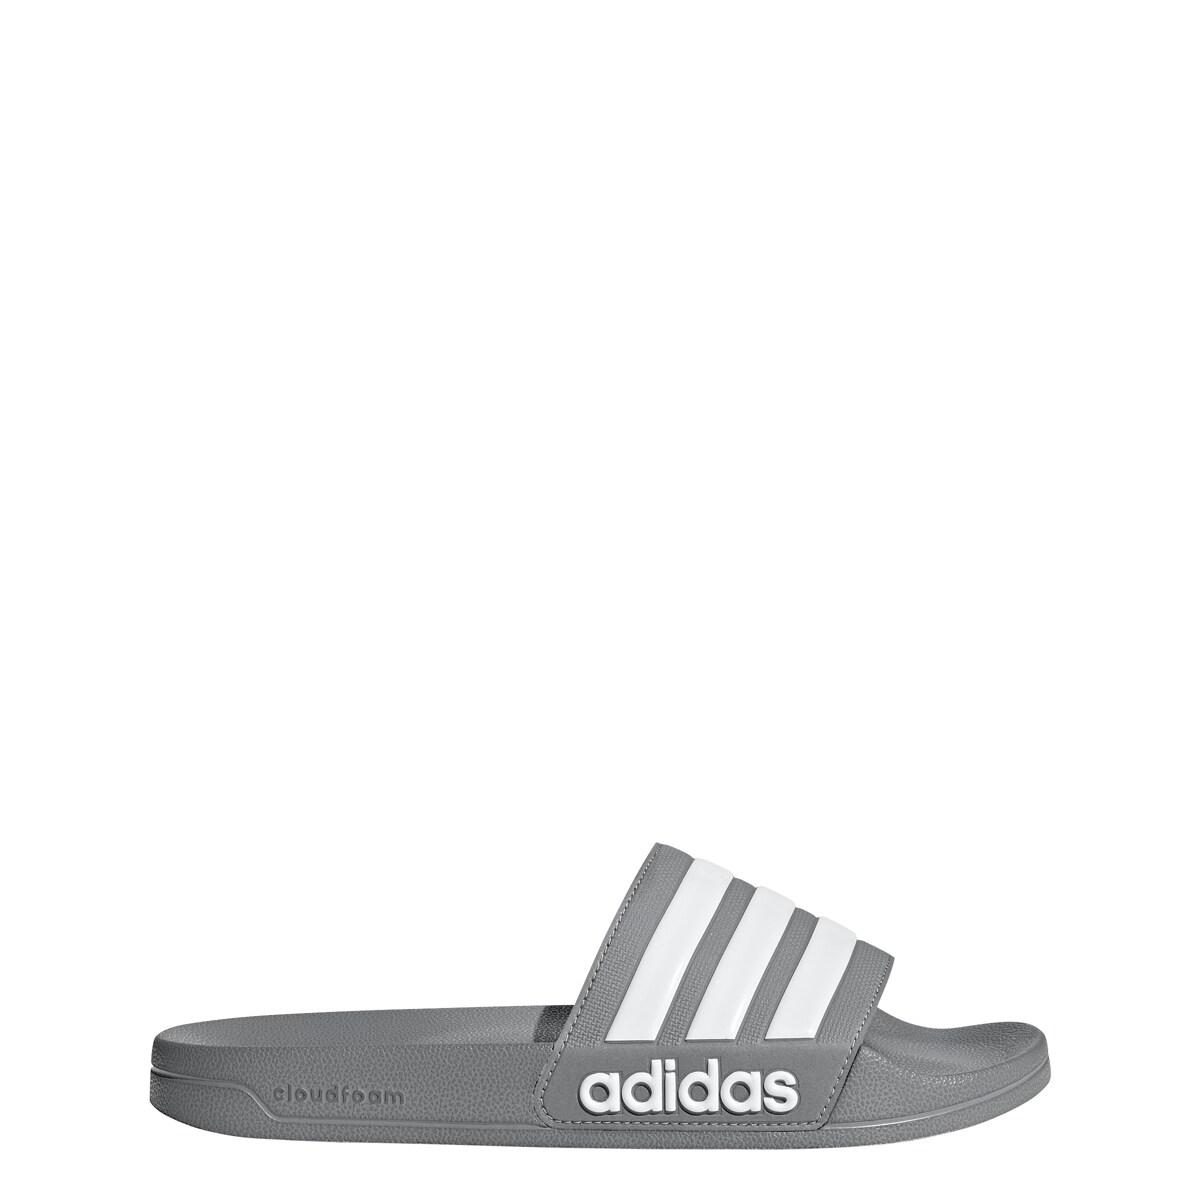 db78f824c Shop Adidas Originals Men s Adilette Shower Slide Sandal - Free Shipping On  Orders Over  45 - Overstock - 27296158